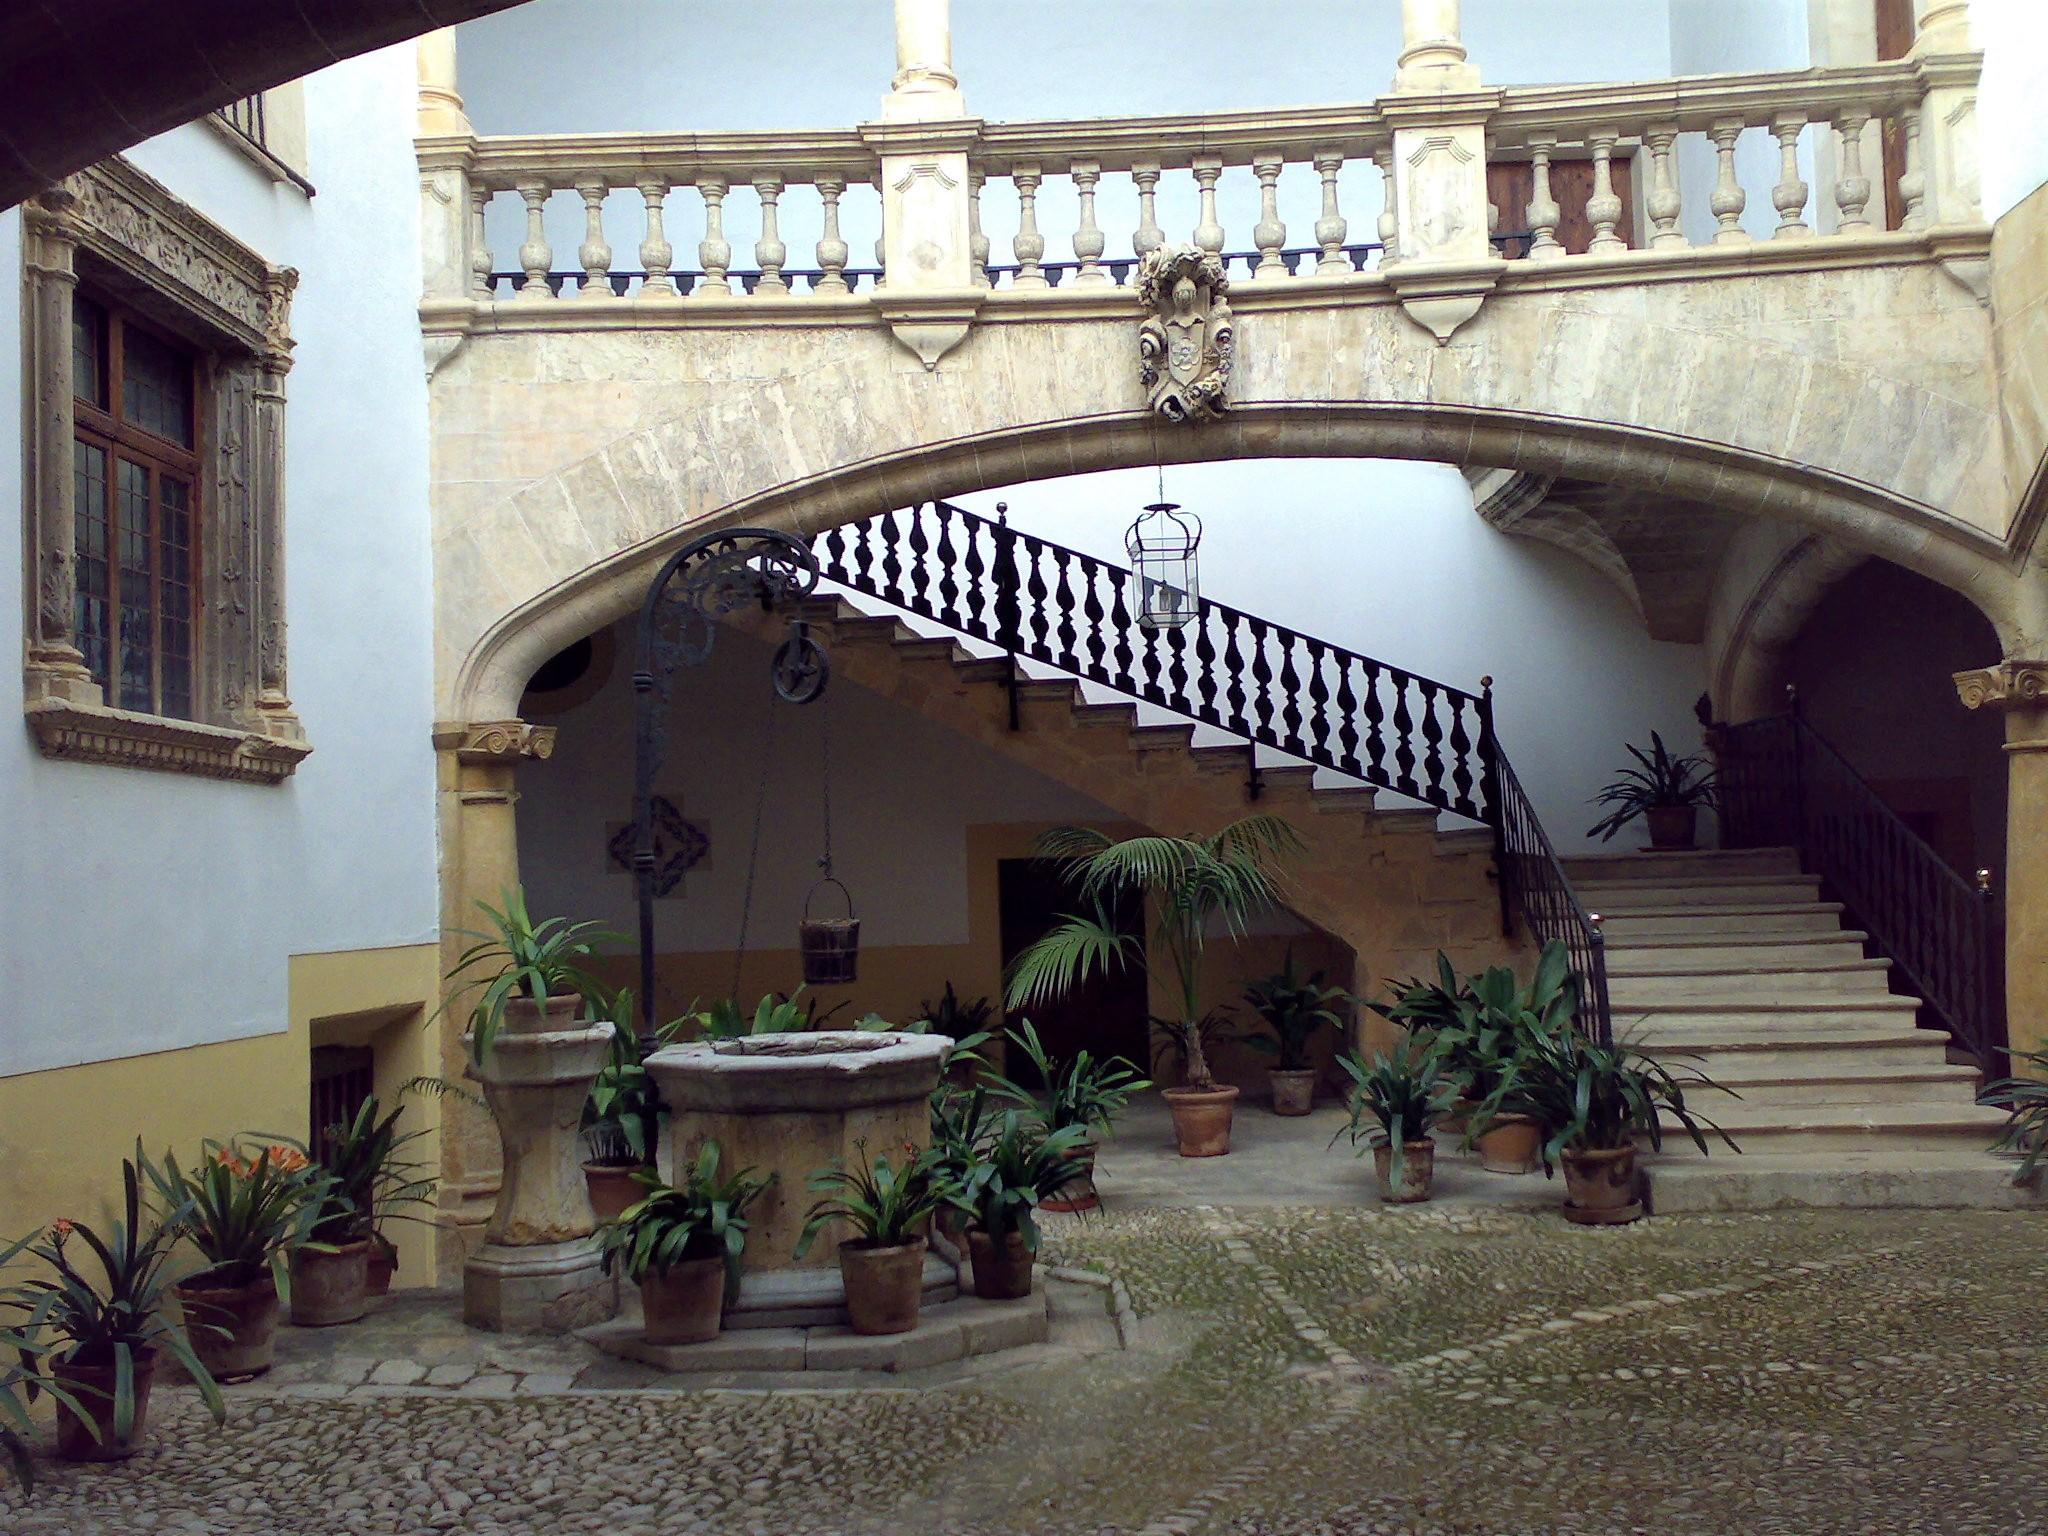 Along Carrer del Sant Crist on Palma audio tour Palma's Alternative History Tour